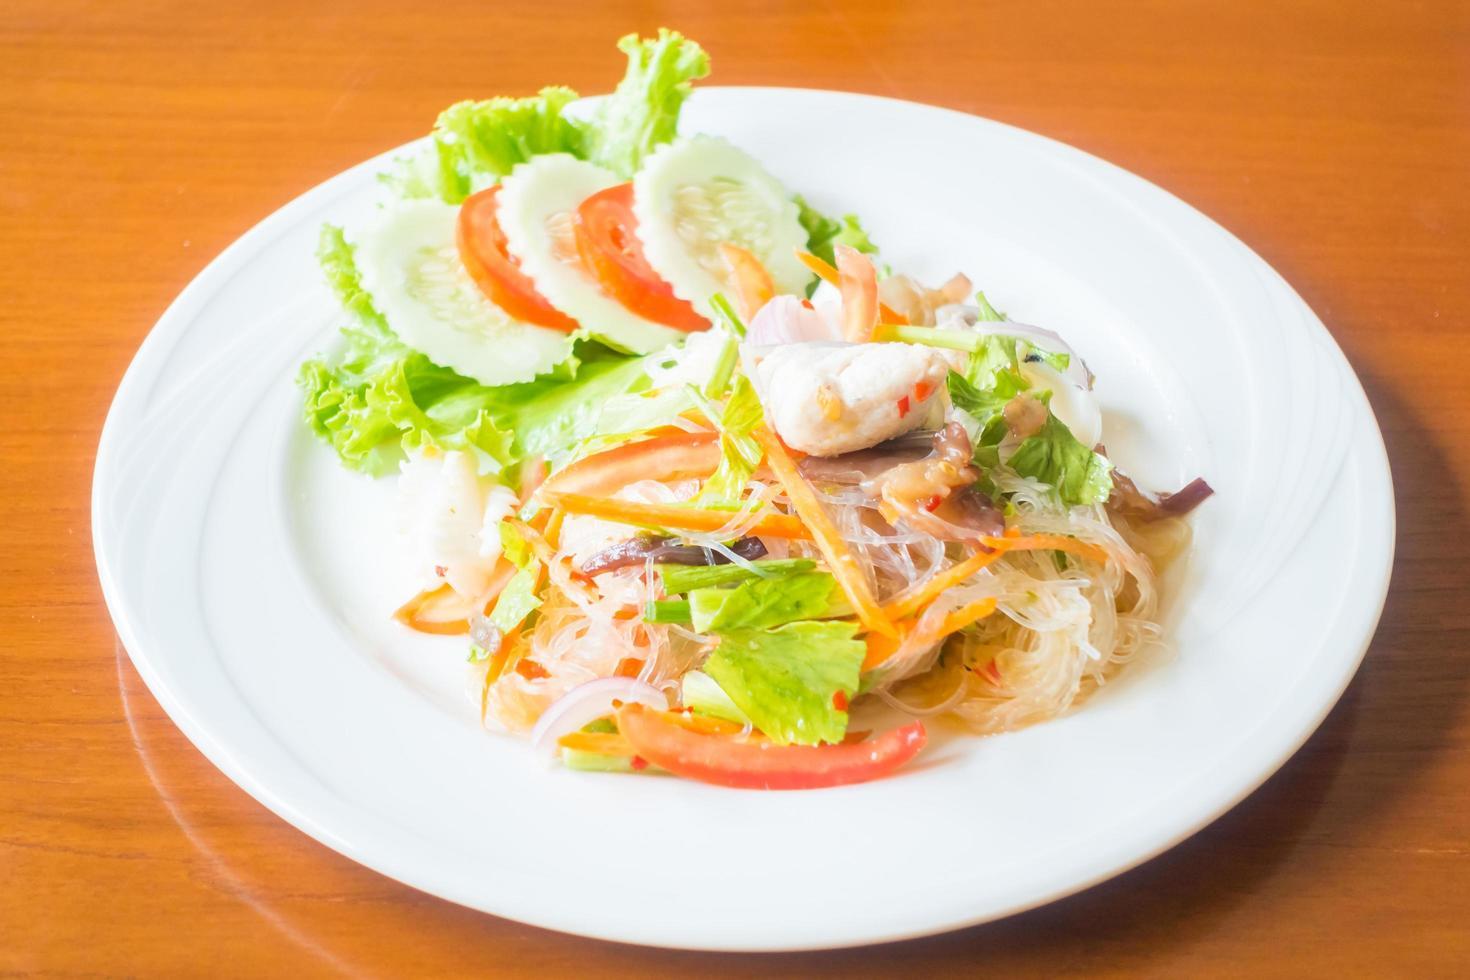 salade épicée thaï photo